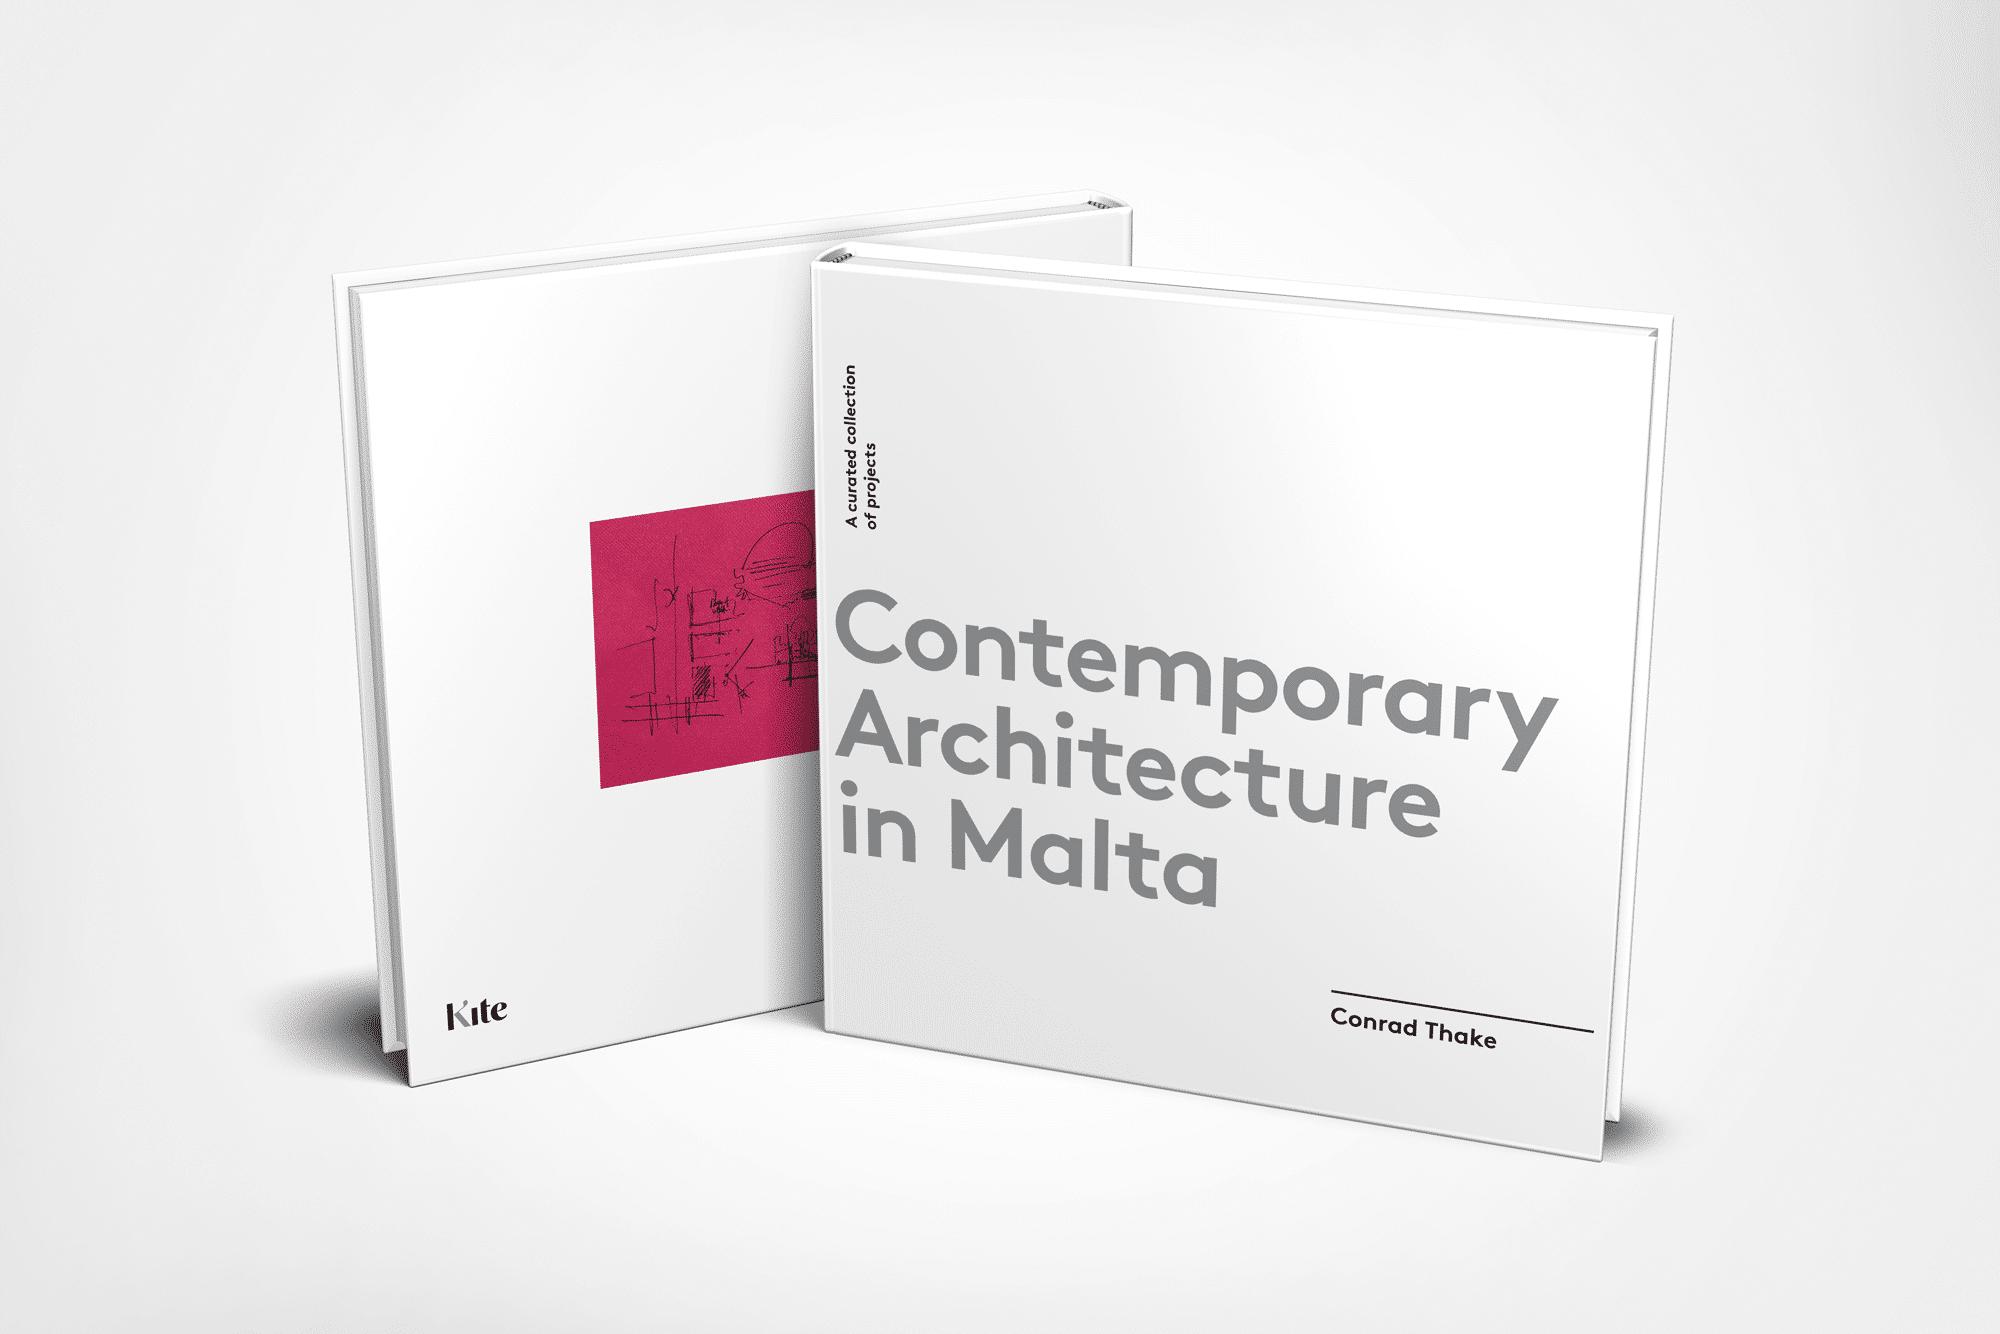 Kite Group | Contemporary Architecture in Malta - Kite Group